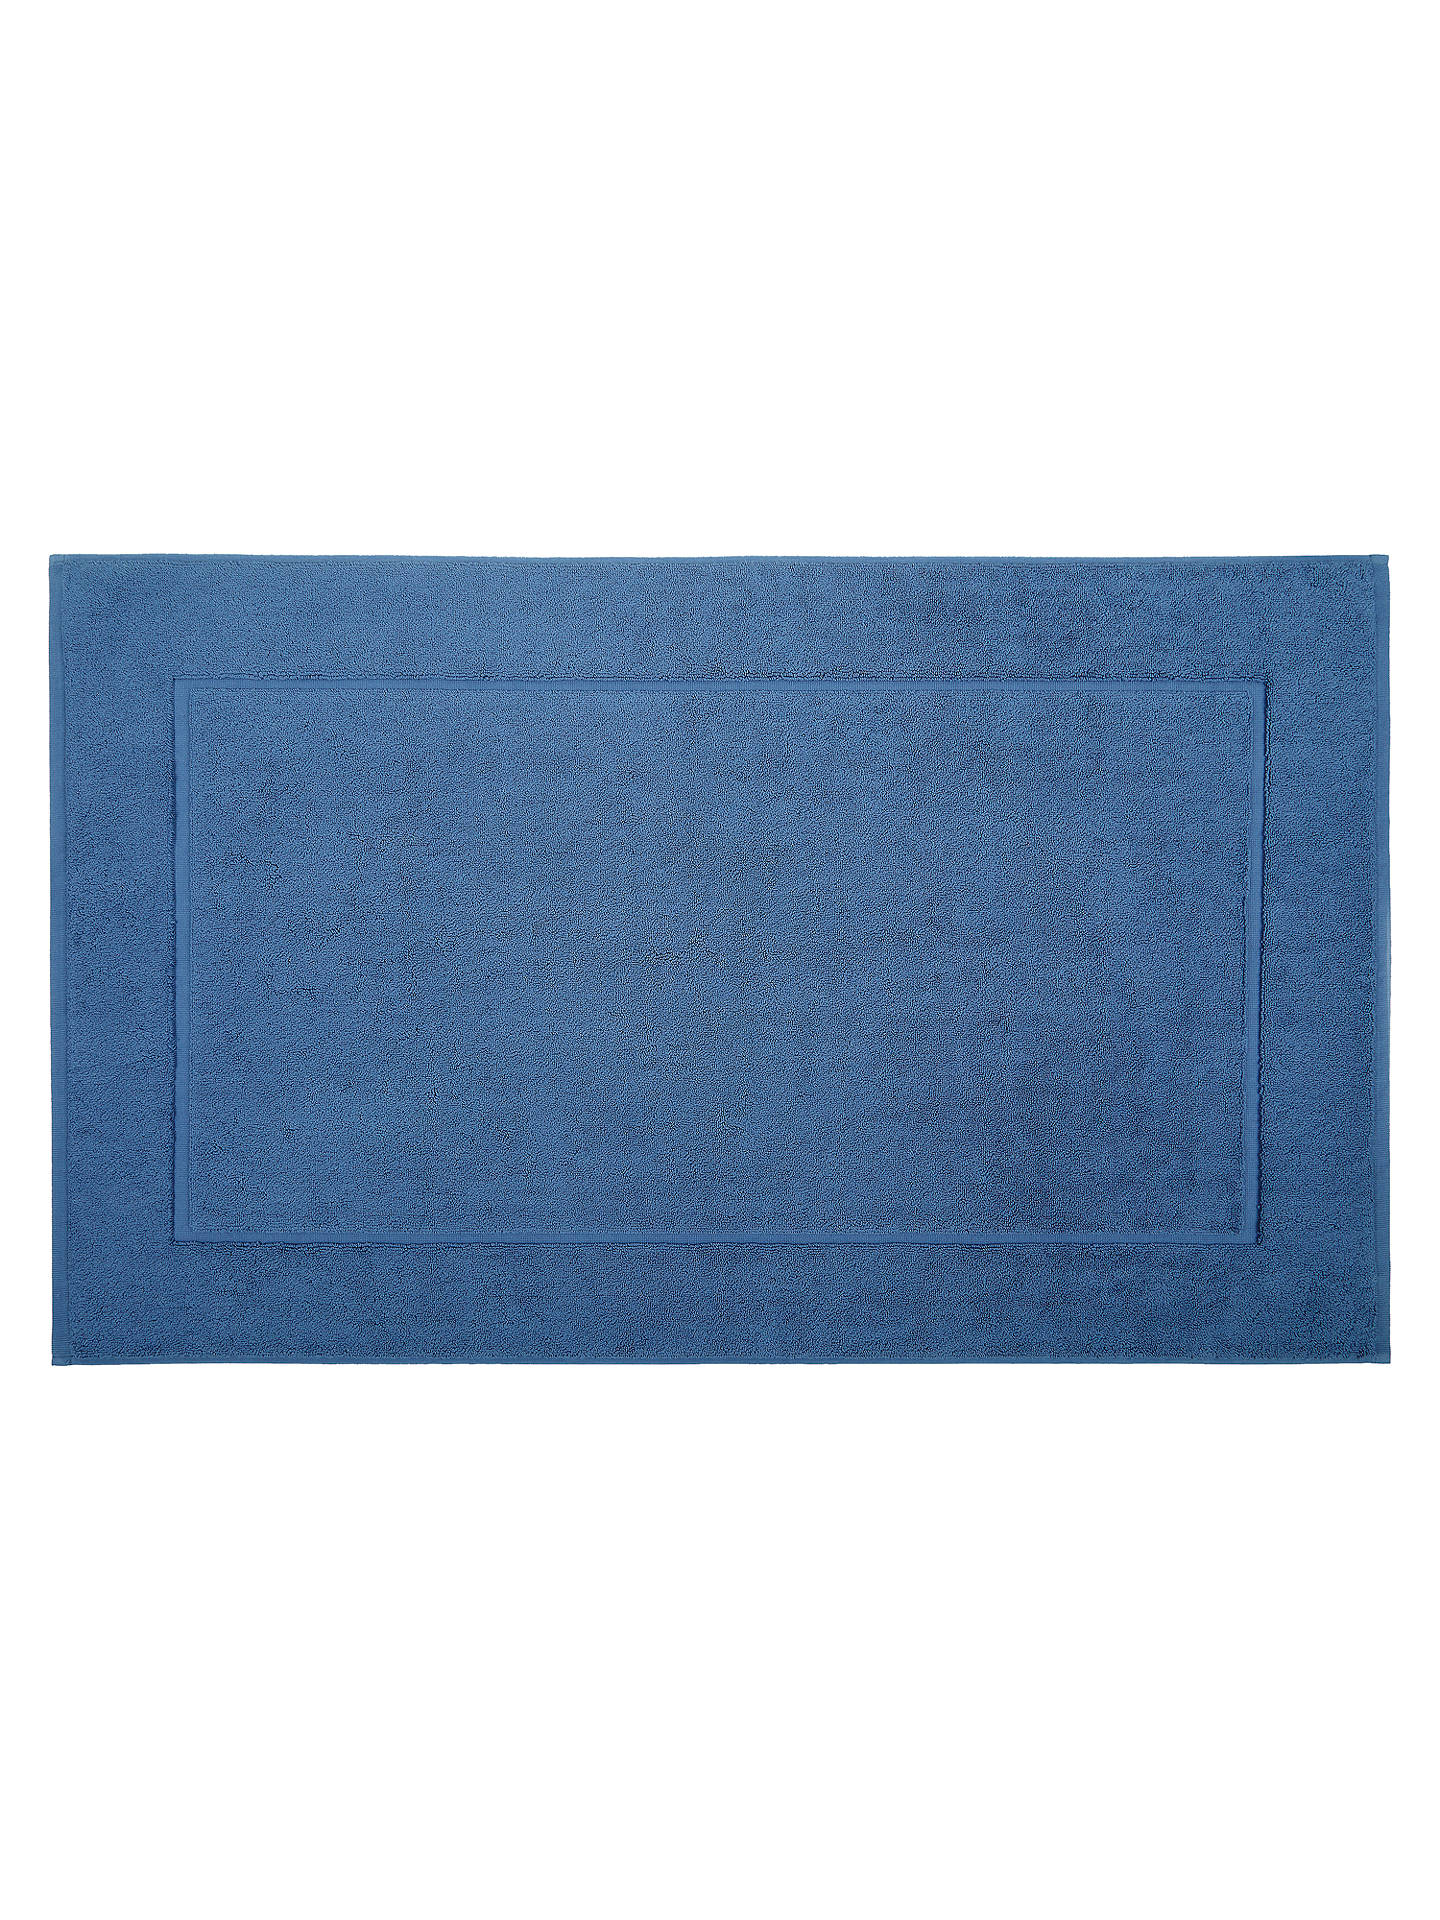 john lewis supreme terry cotton bath mat at john lewis partners. Black Bedroom Furniture Sets. Home Design Ideas